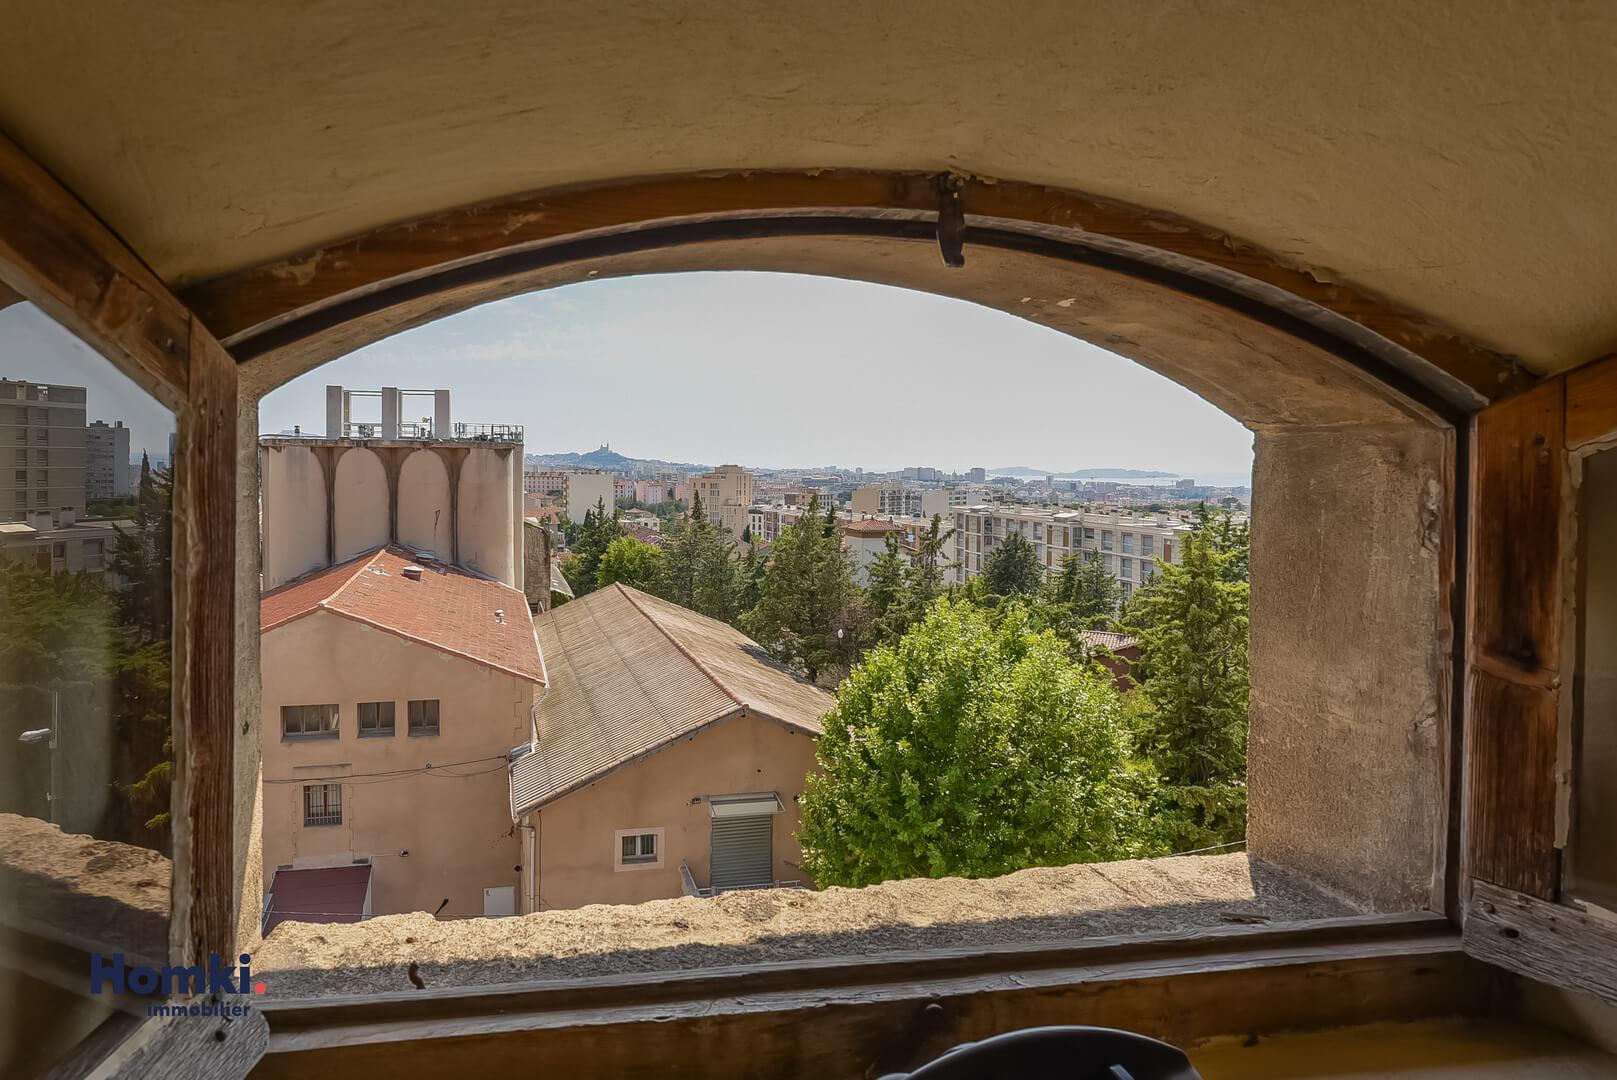 Vente loft Marseille T3 13013 130m²_10